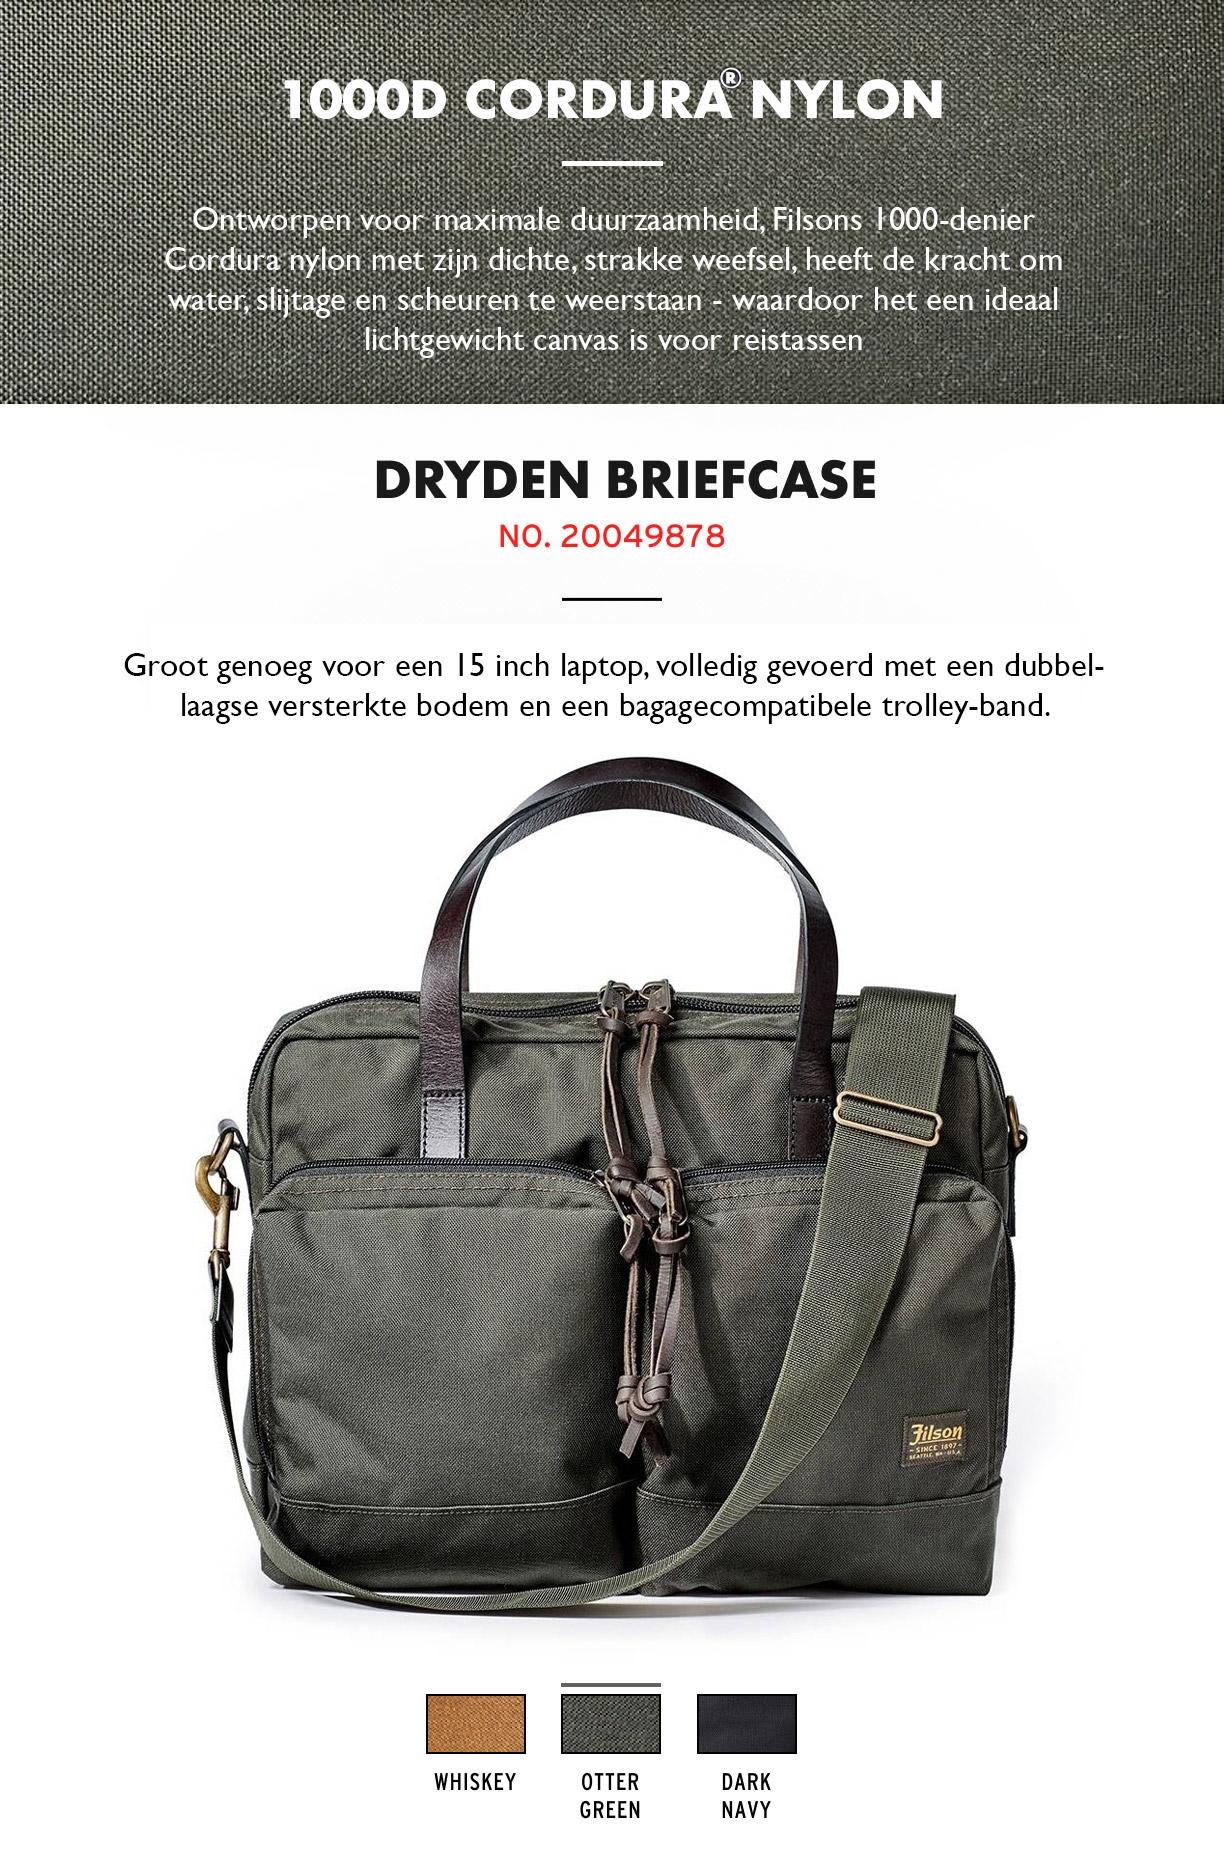 Filson Dryden Briefcase Otter Green Product-informatie